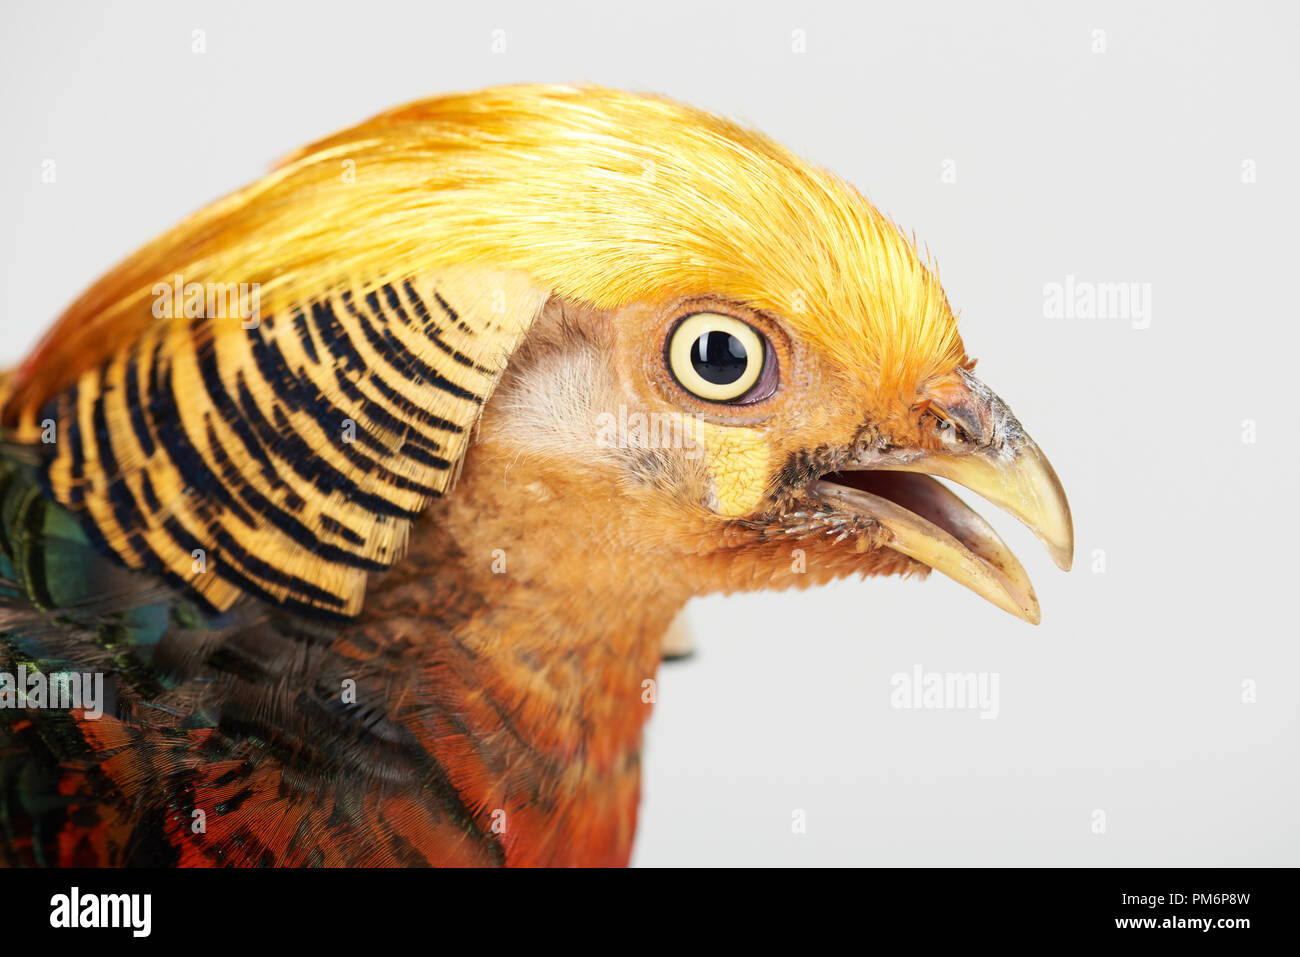 Yellow head of pheasant isolated on white studio background - Stock Image